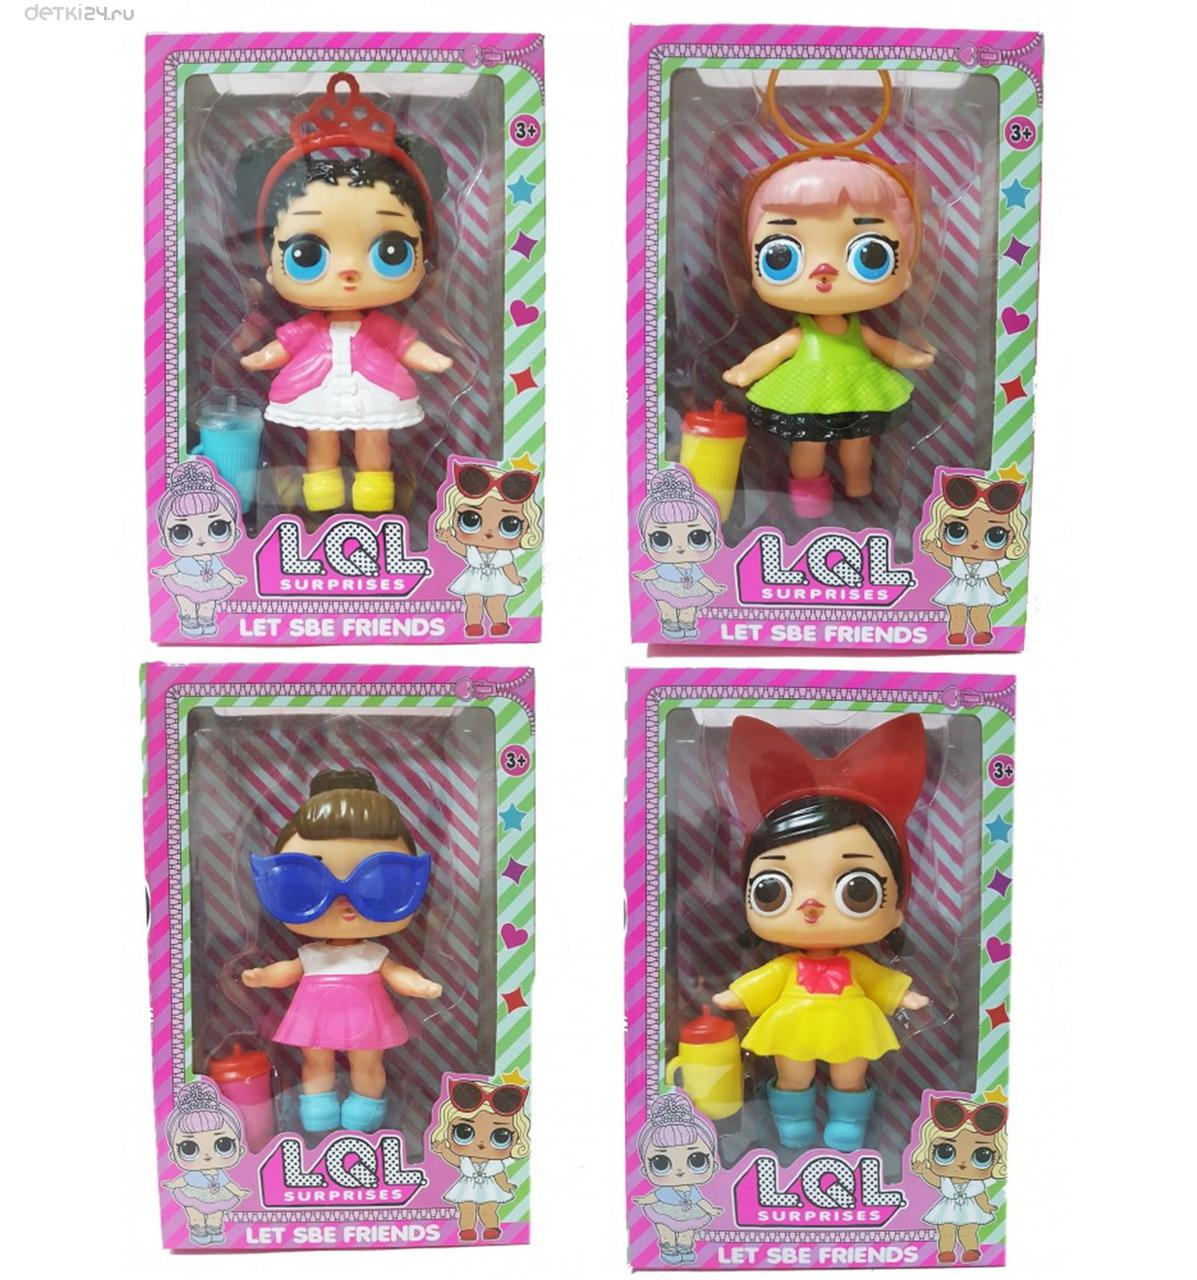 Куколка ЛОЛ, кукла 15 см LOL, в коробке с аксессуарами